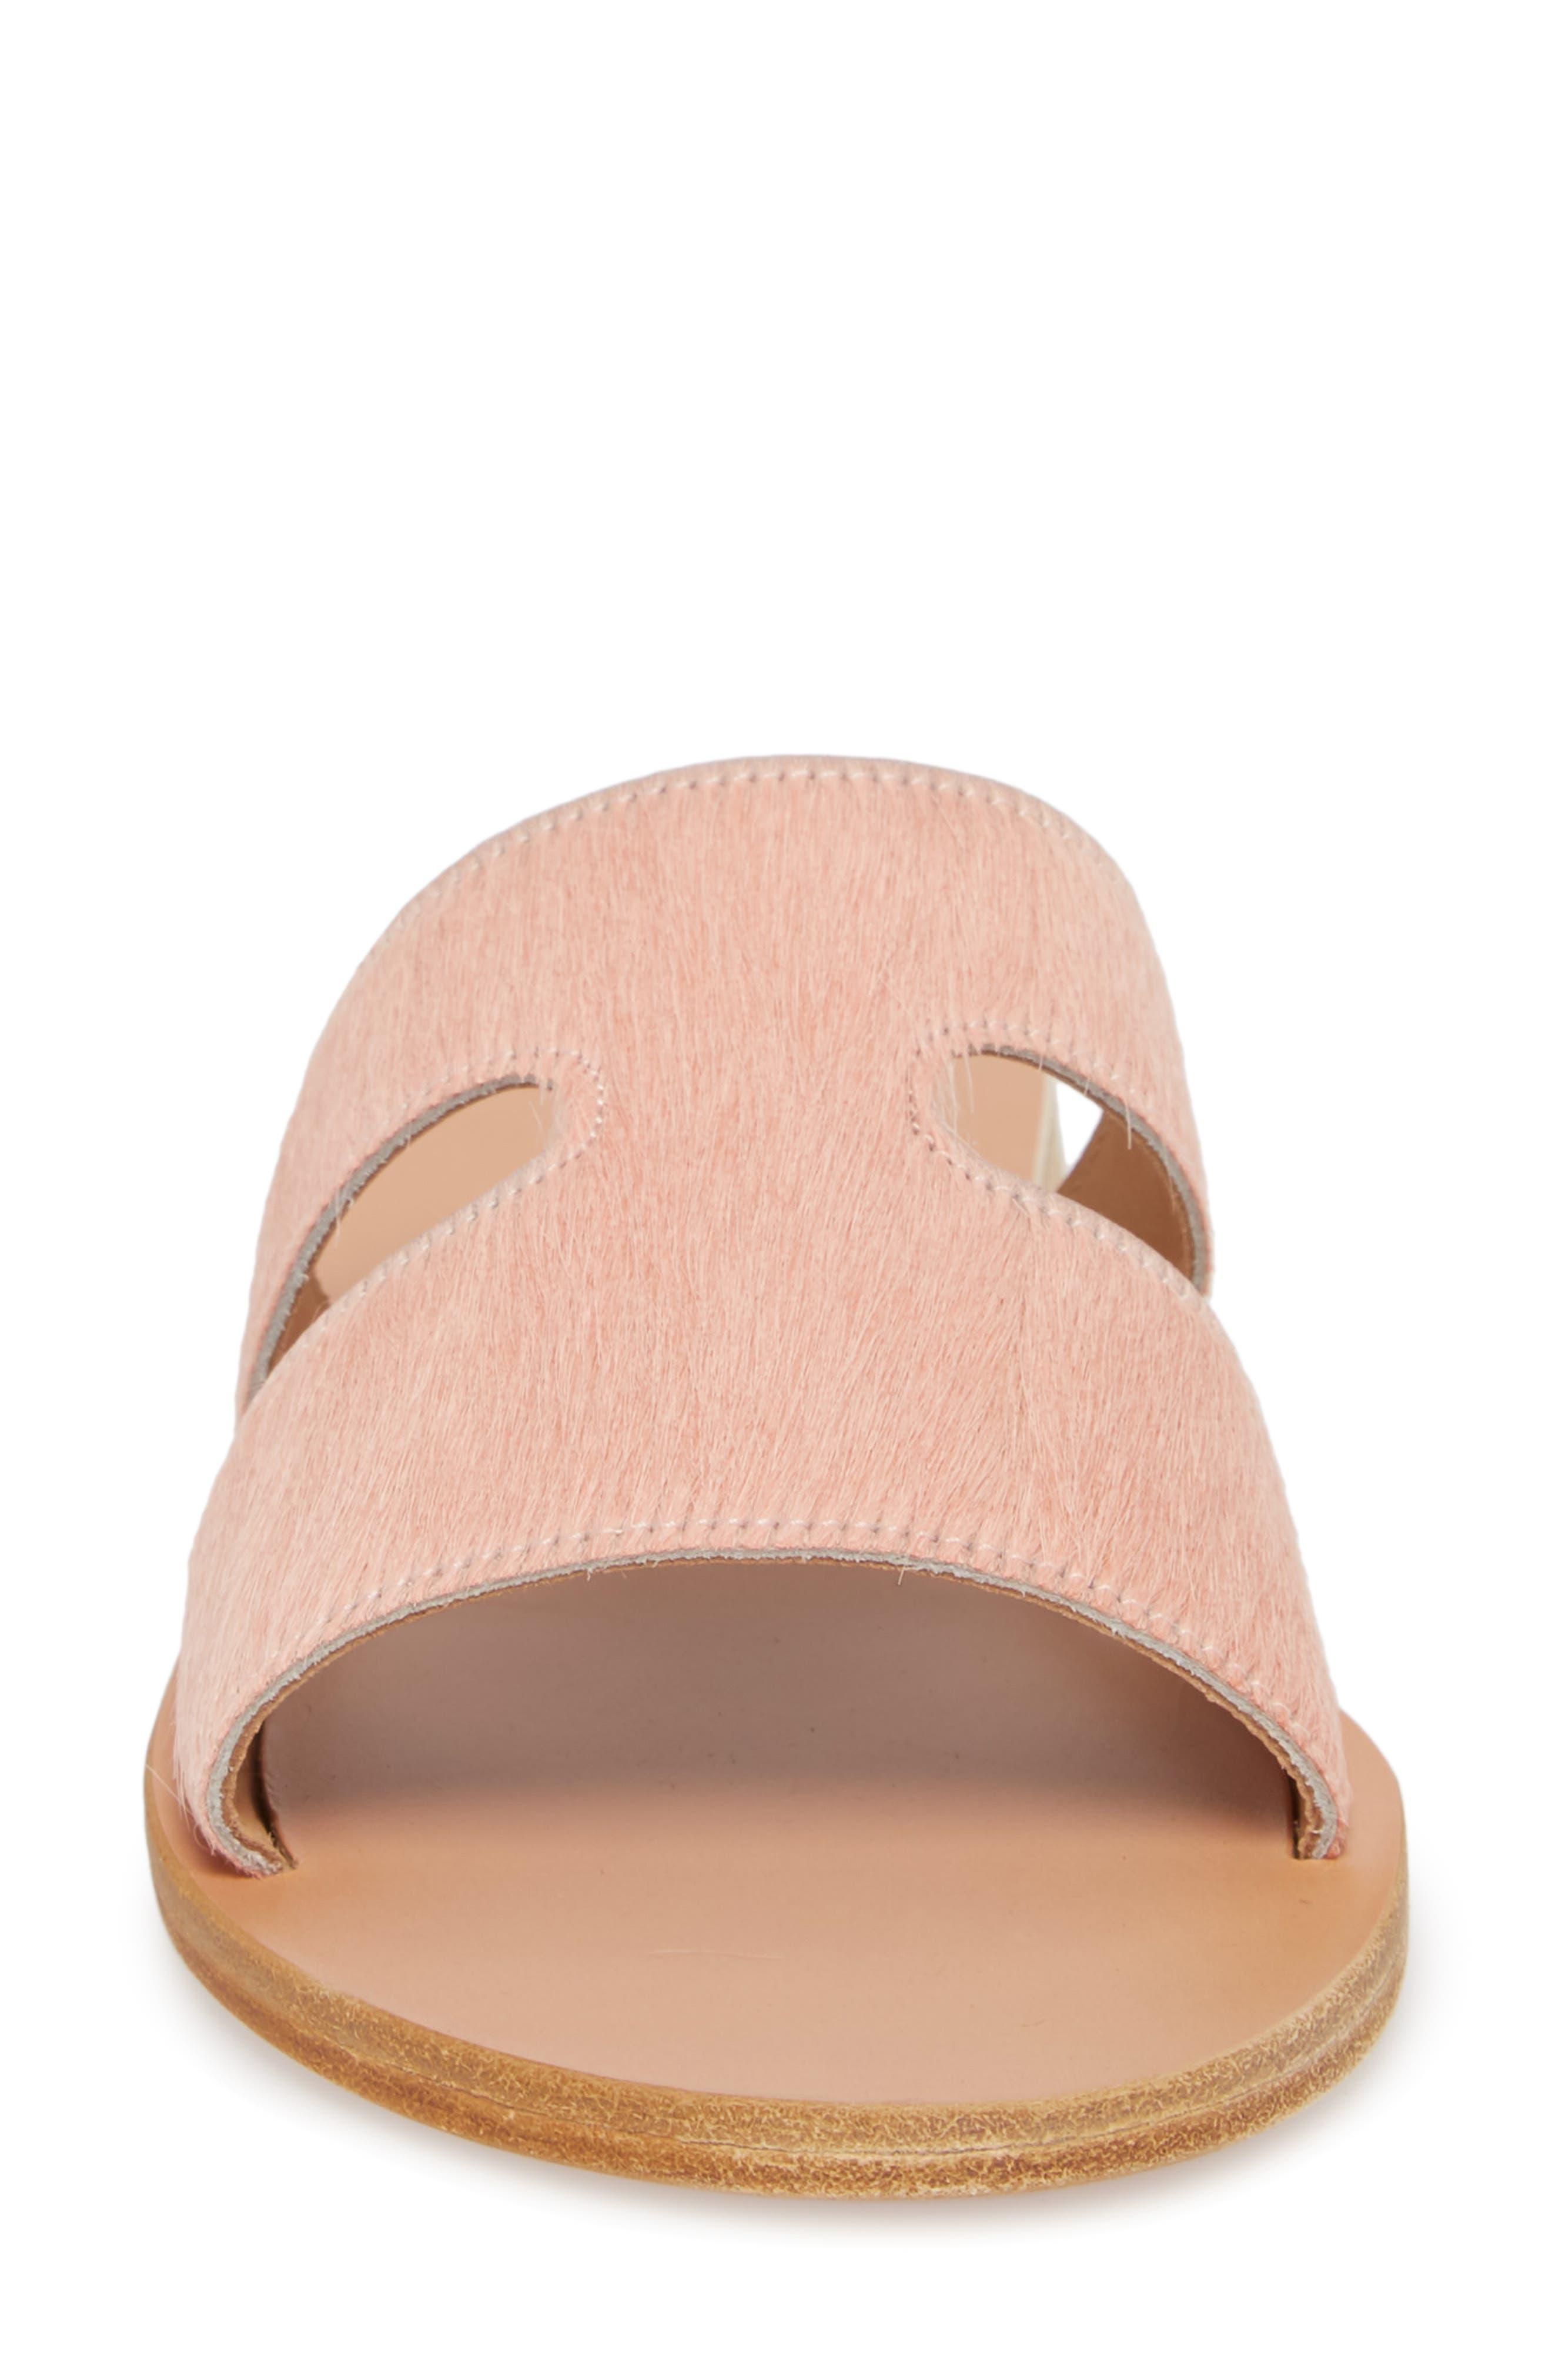 Apteros Genuine Calf Hair Slide Sandal,                             Alternate thumbnail 4, color,                             Pink Pony